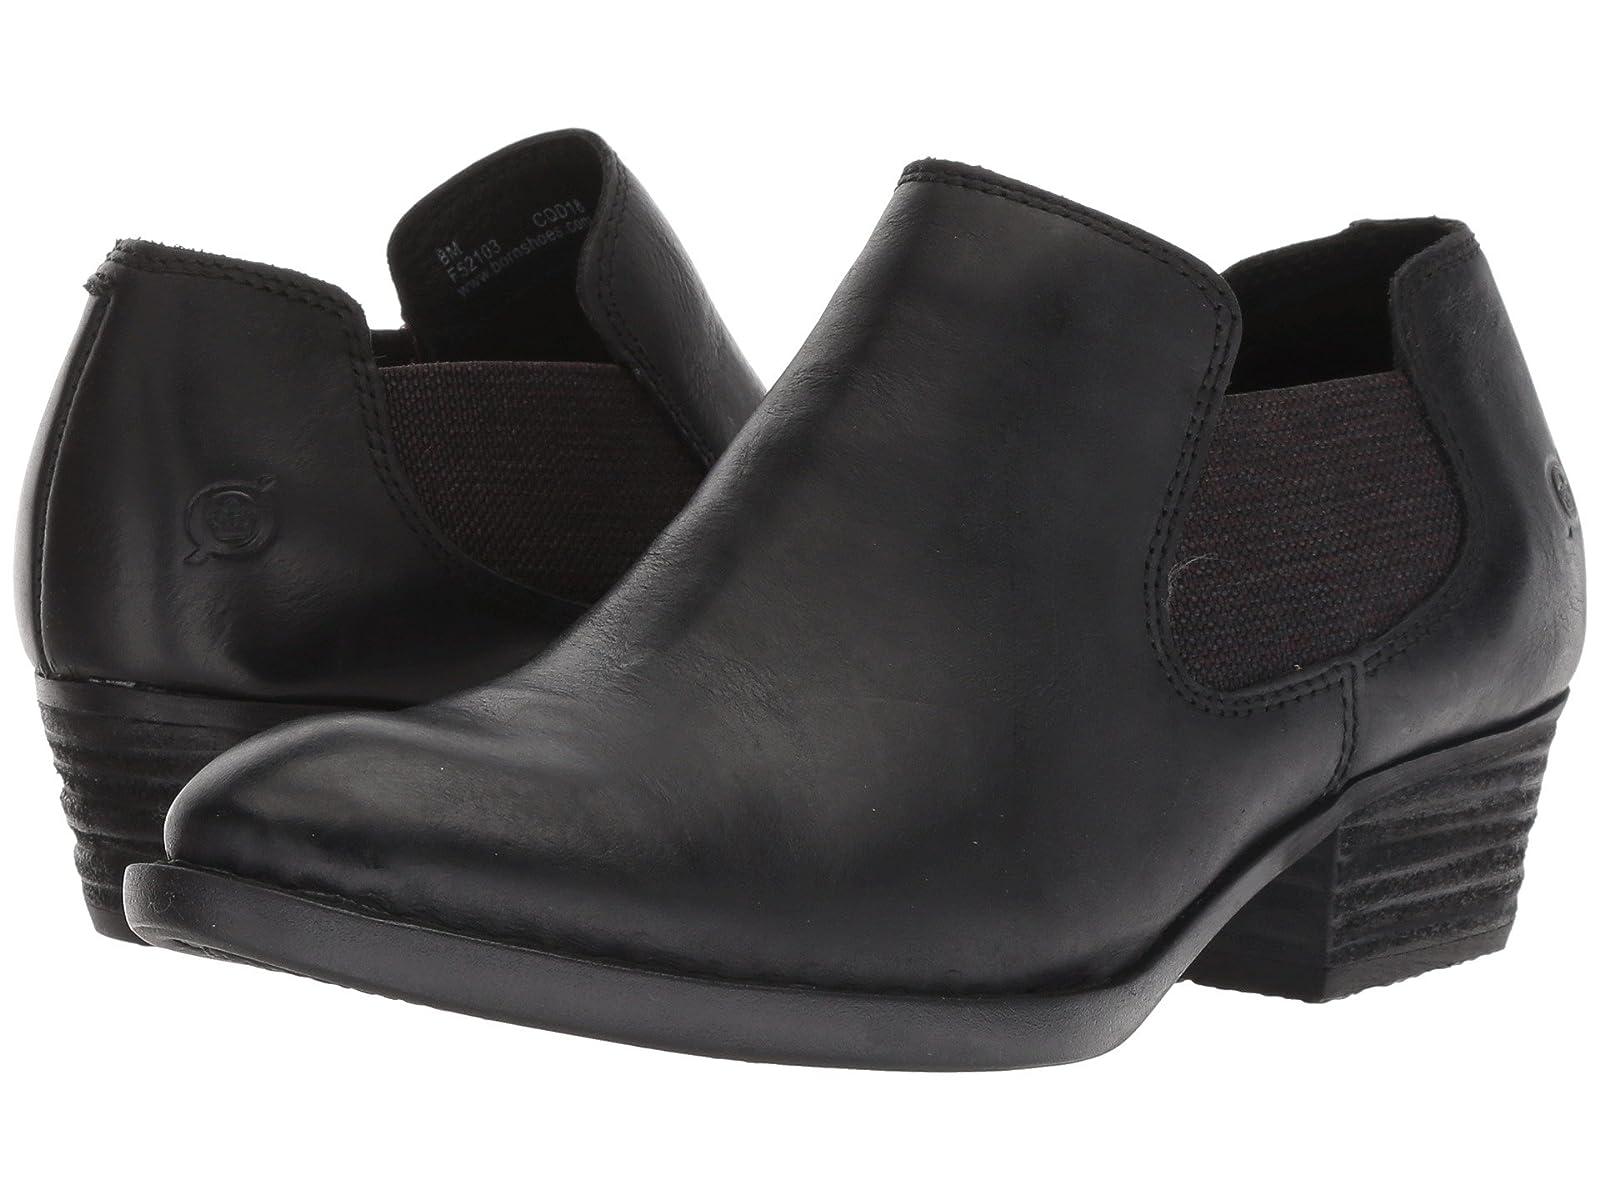 Born DalliaSelling fashionable and eye-catching shoes